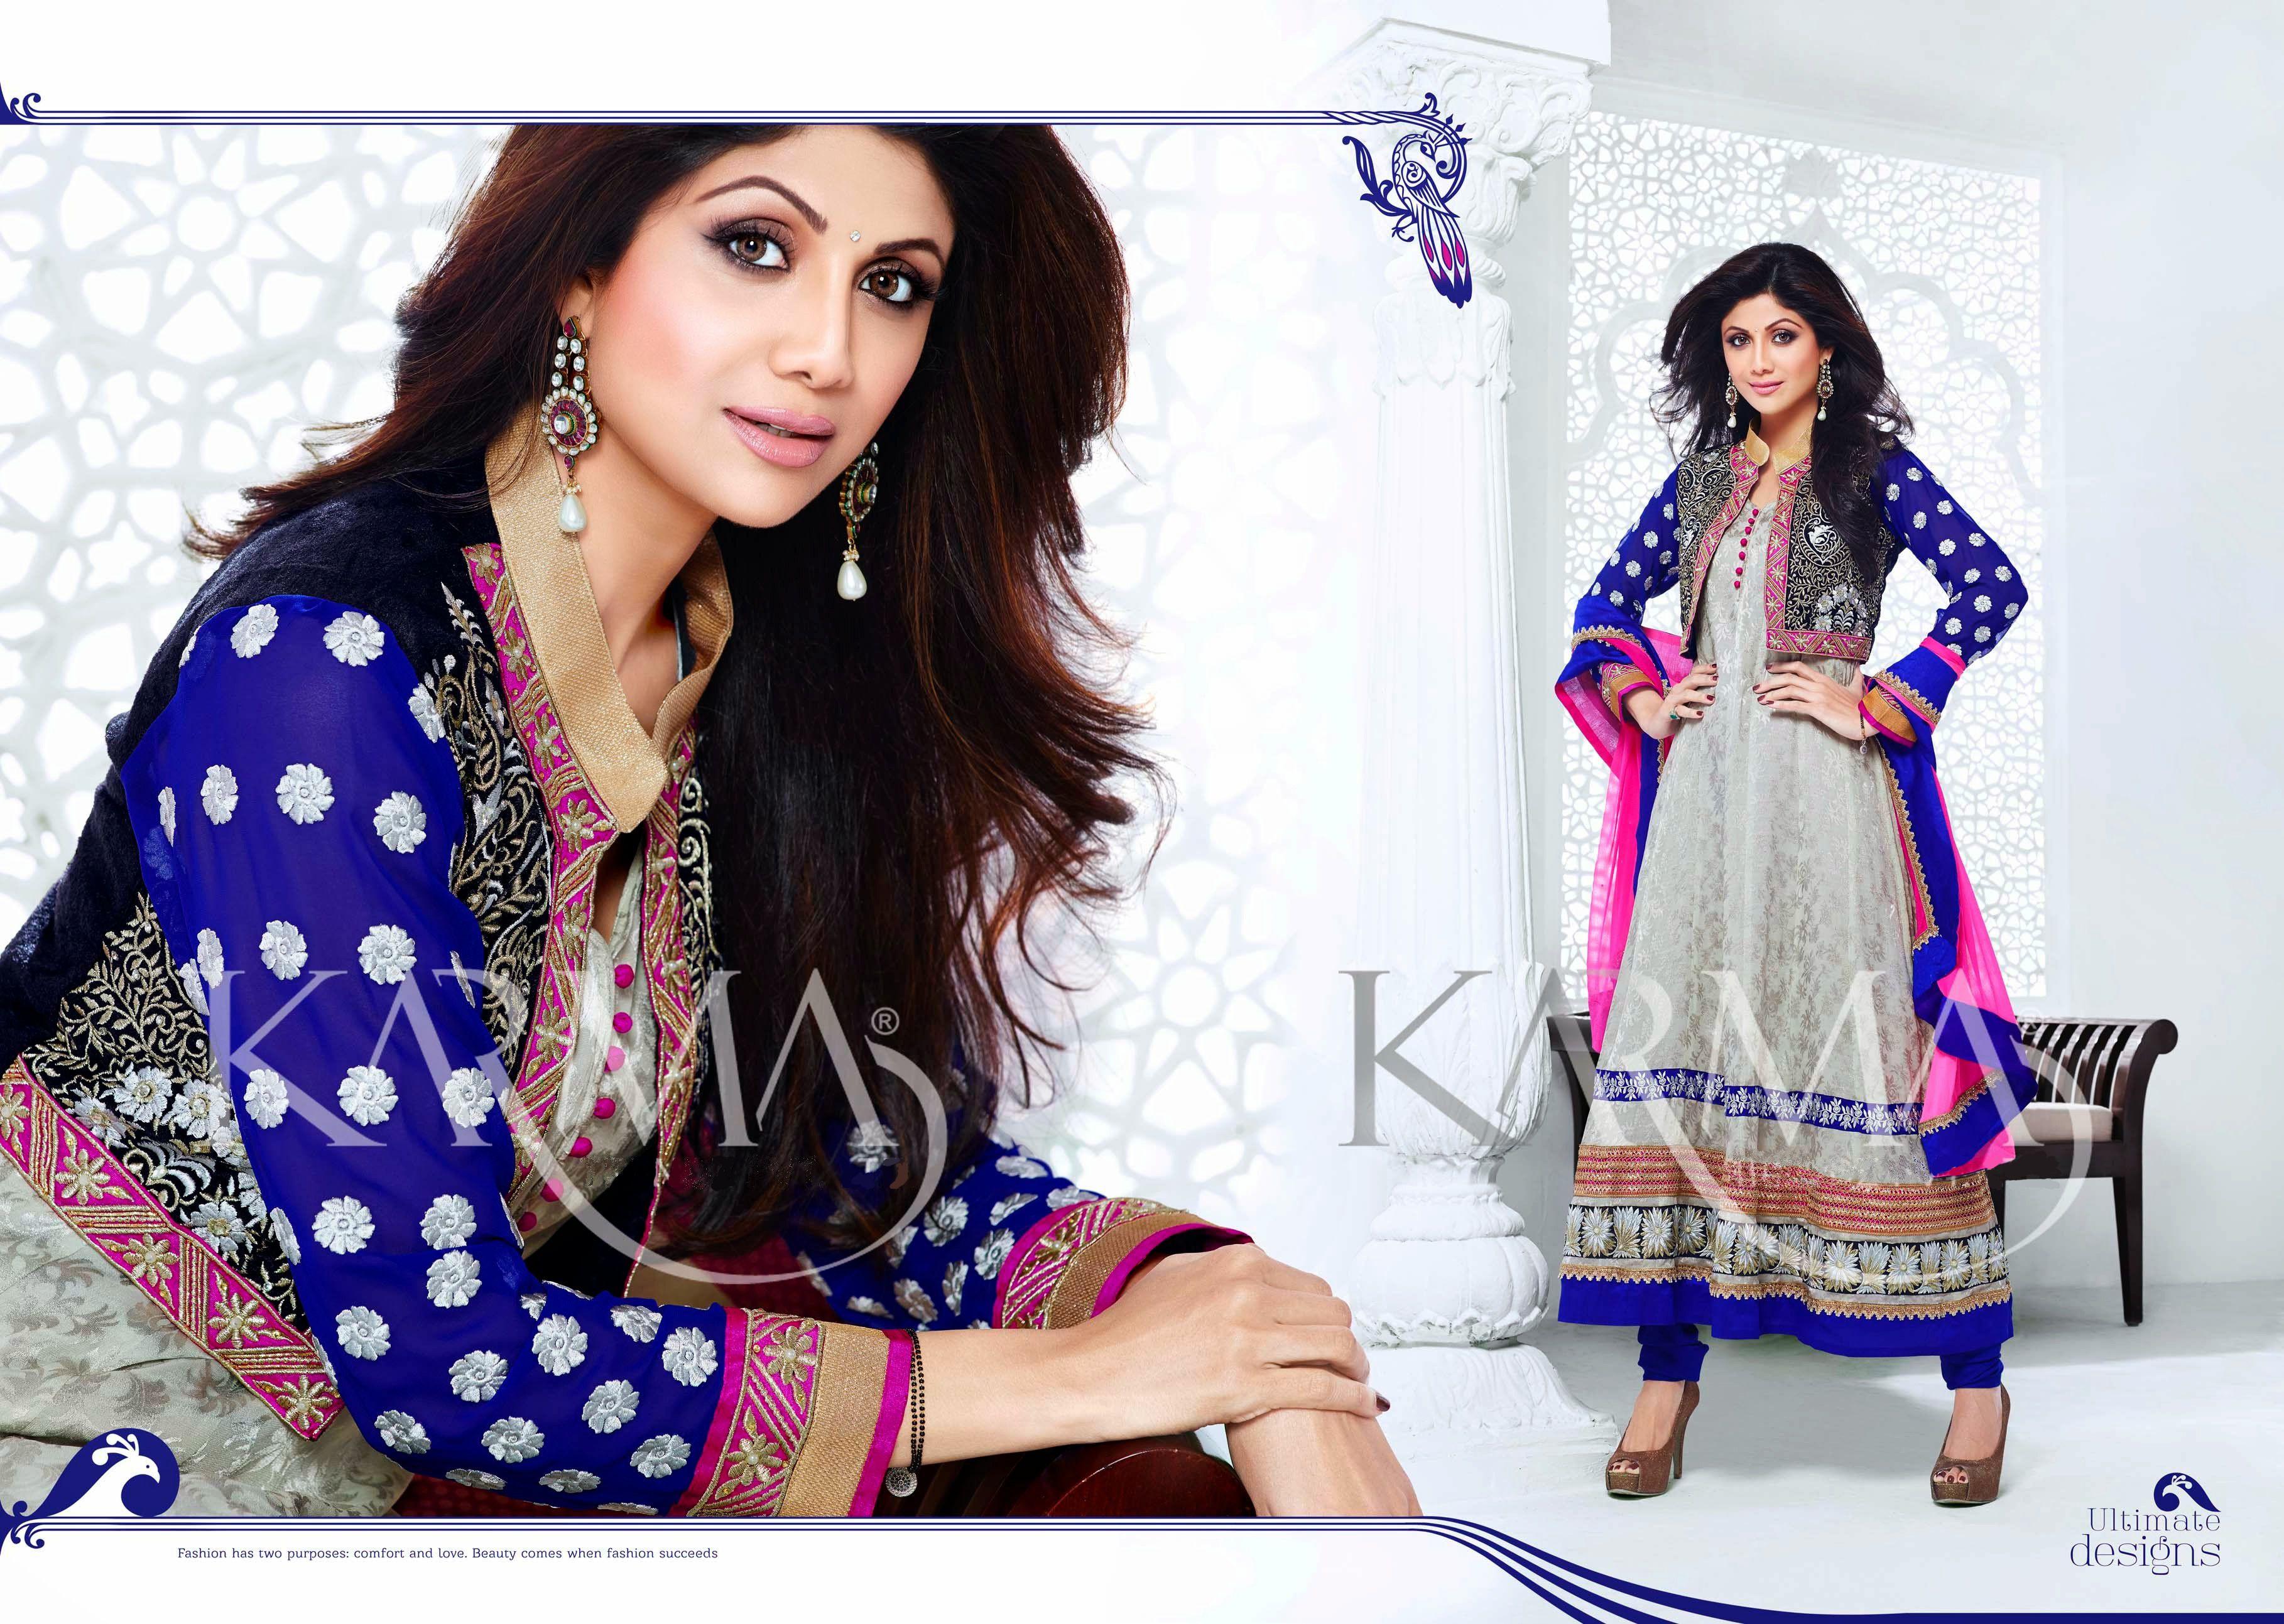 Koti style dress design royal blue